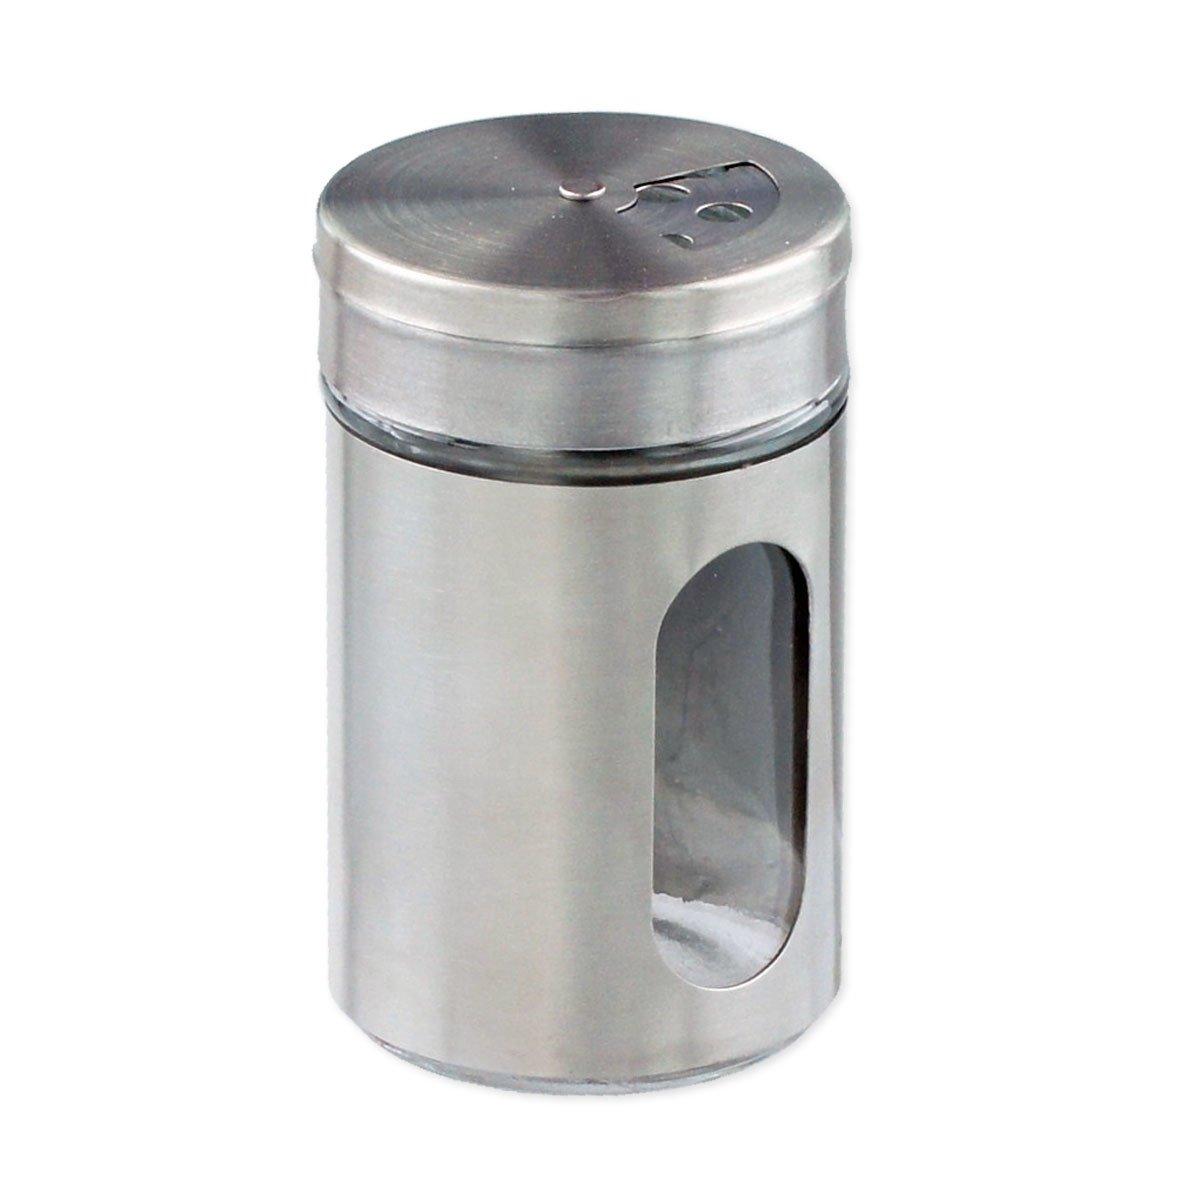 4 oz. Spice Shaker